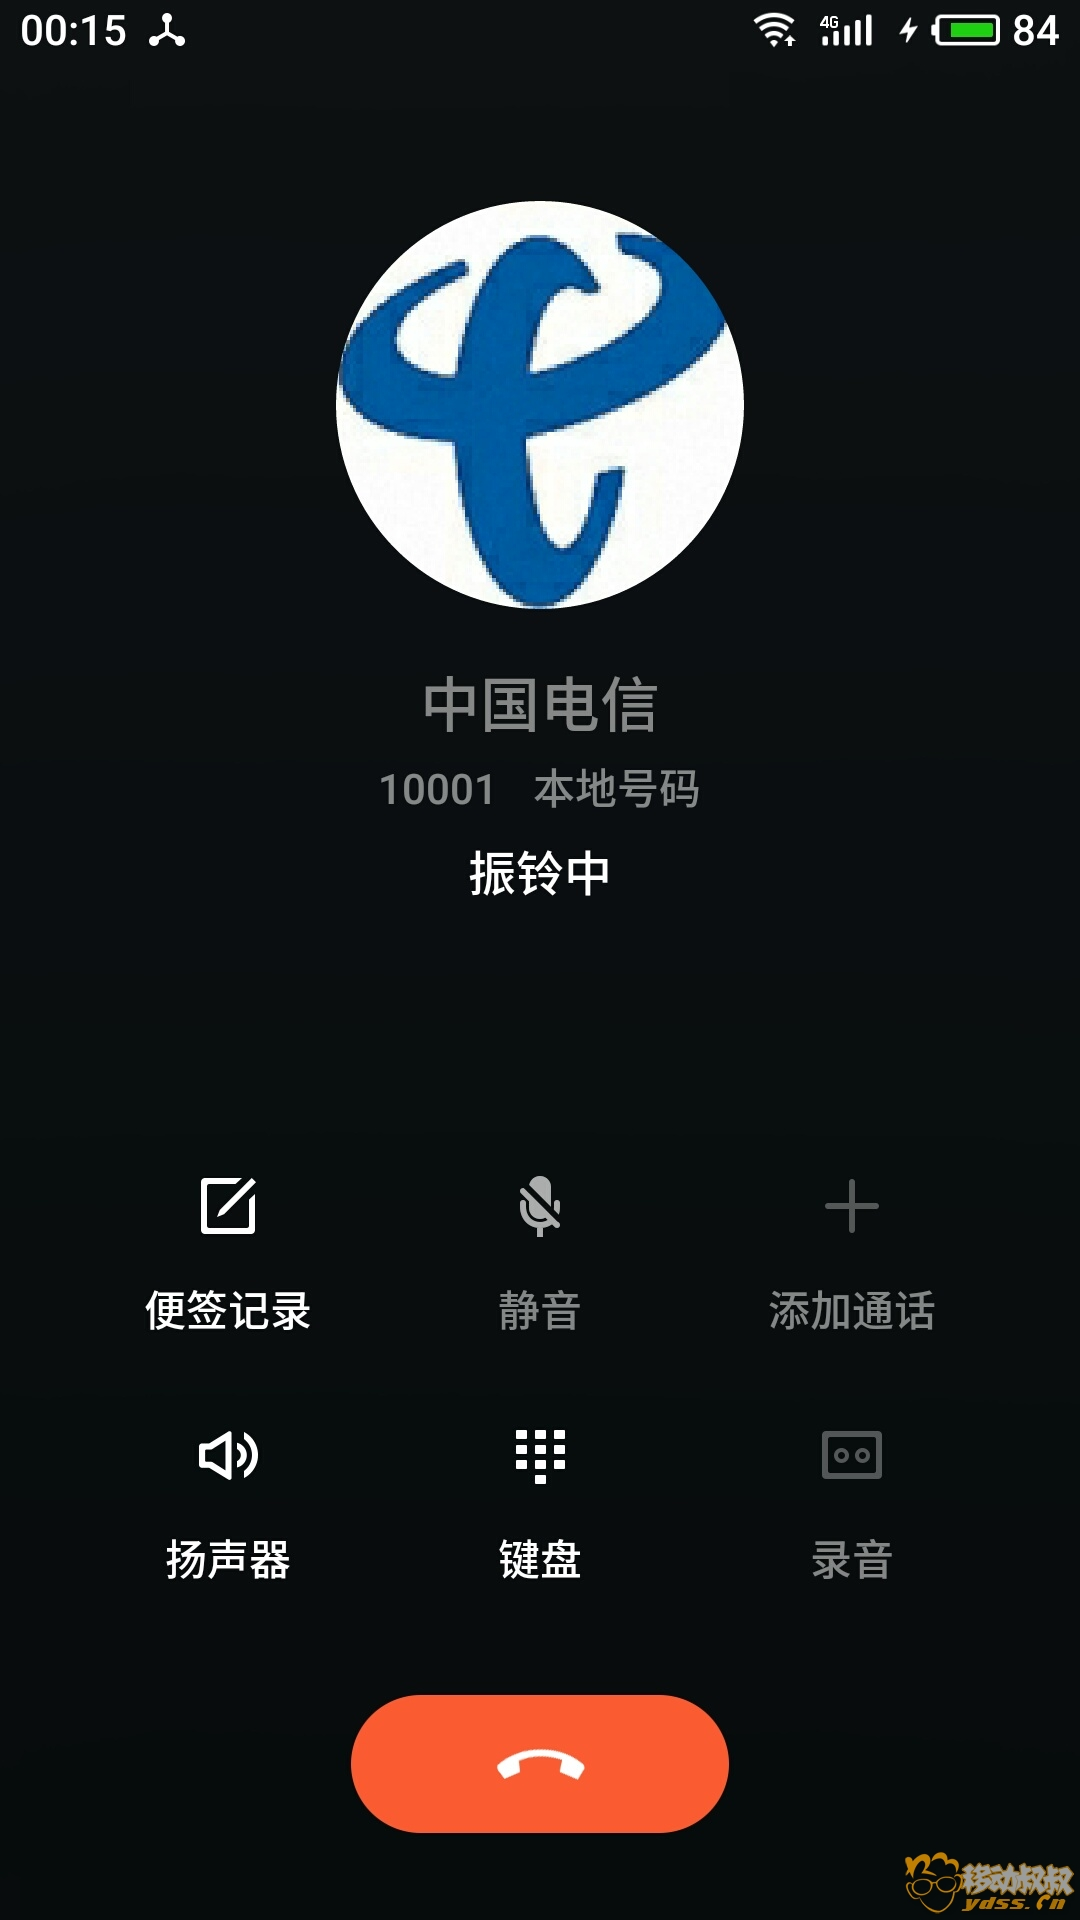 S80114-00150587.jpg